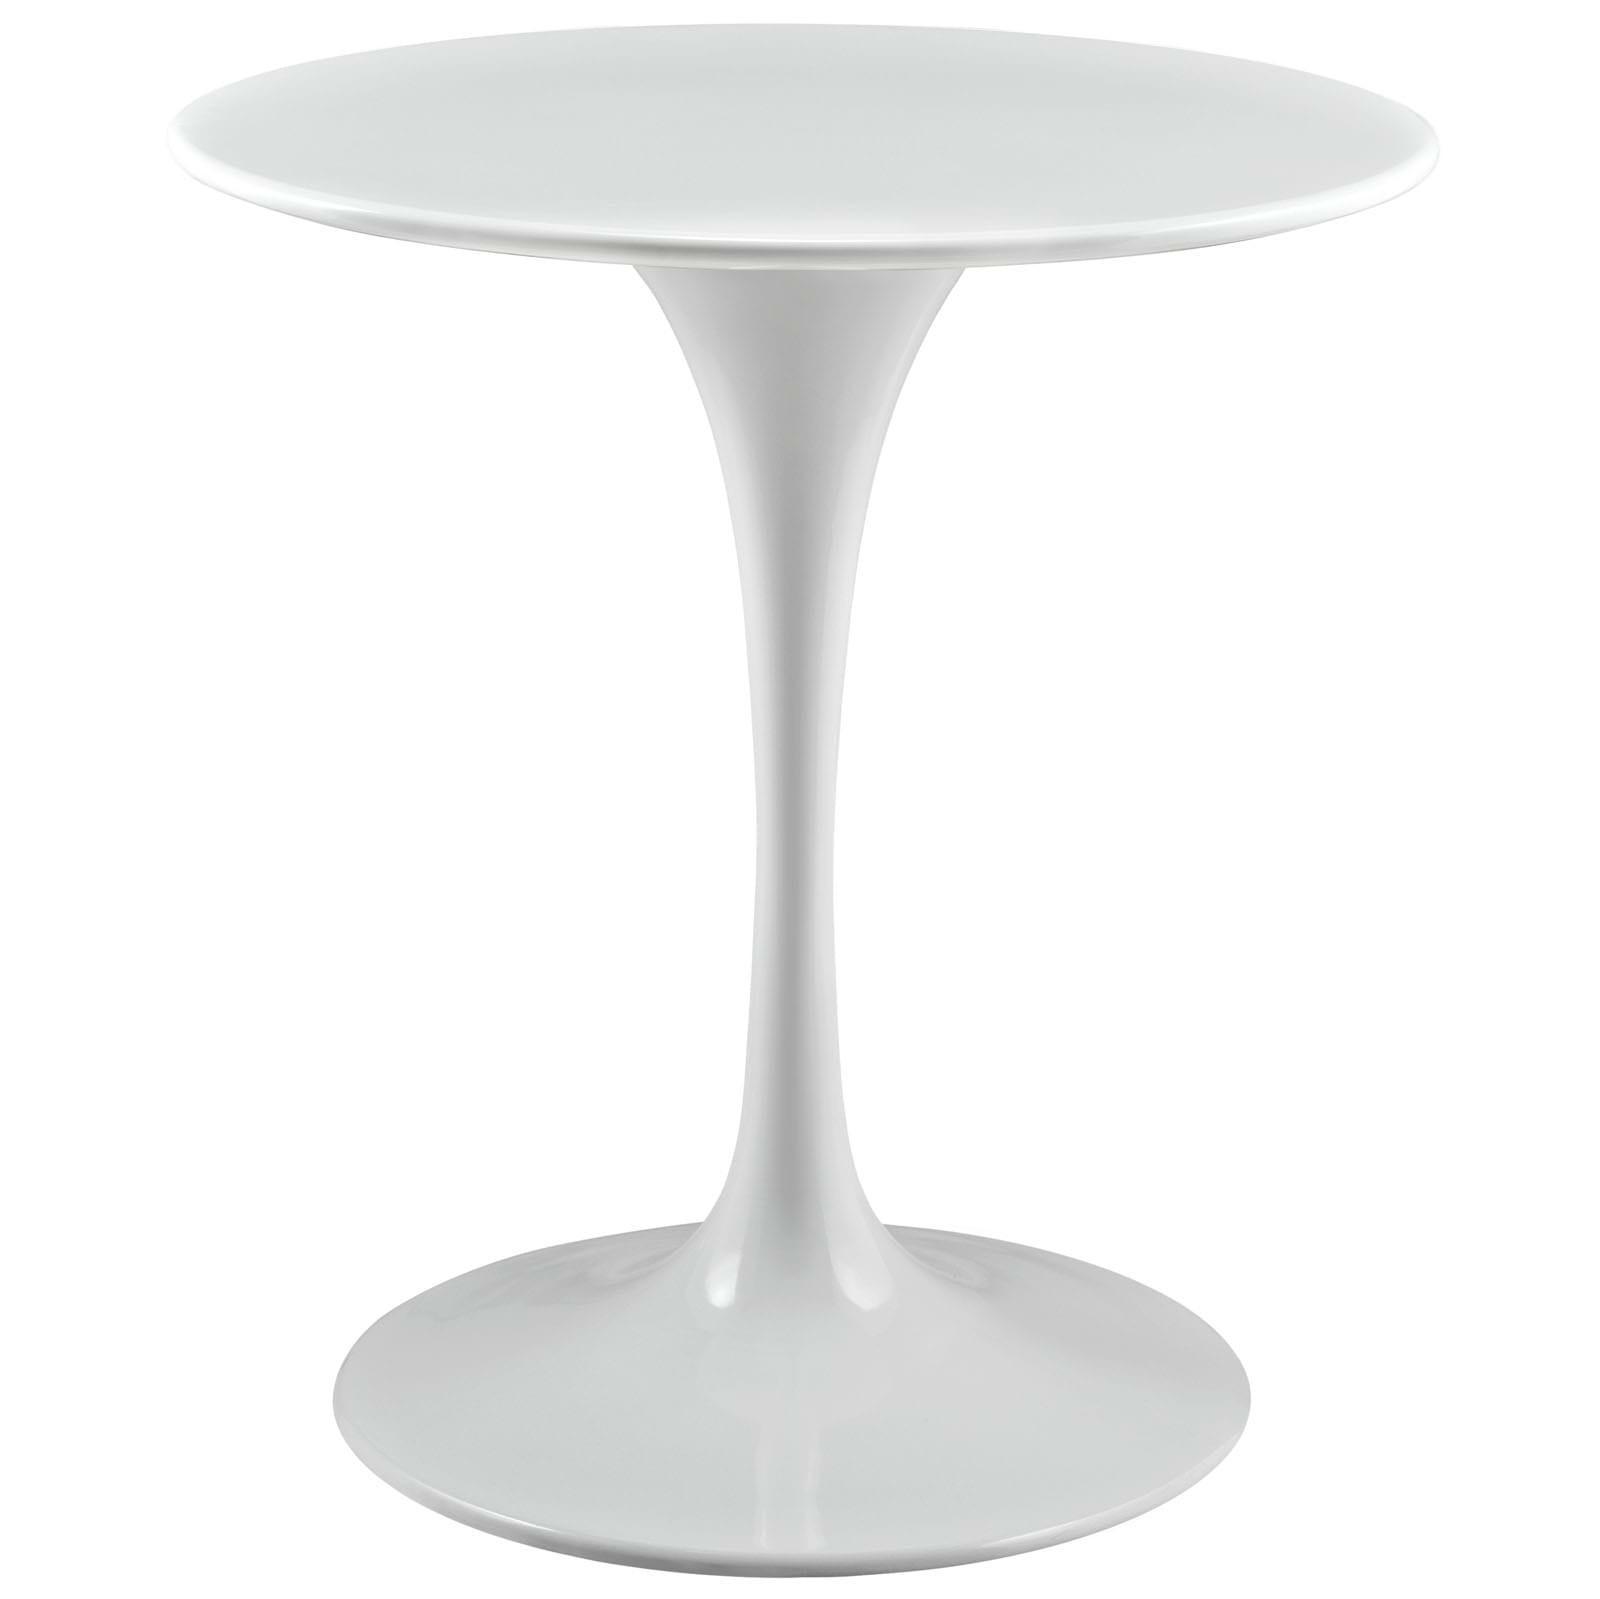 "Lippa 28"" Wood Top Dining Table"